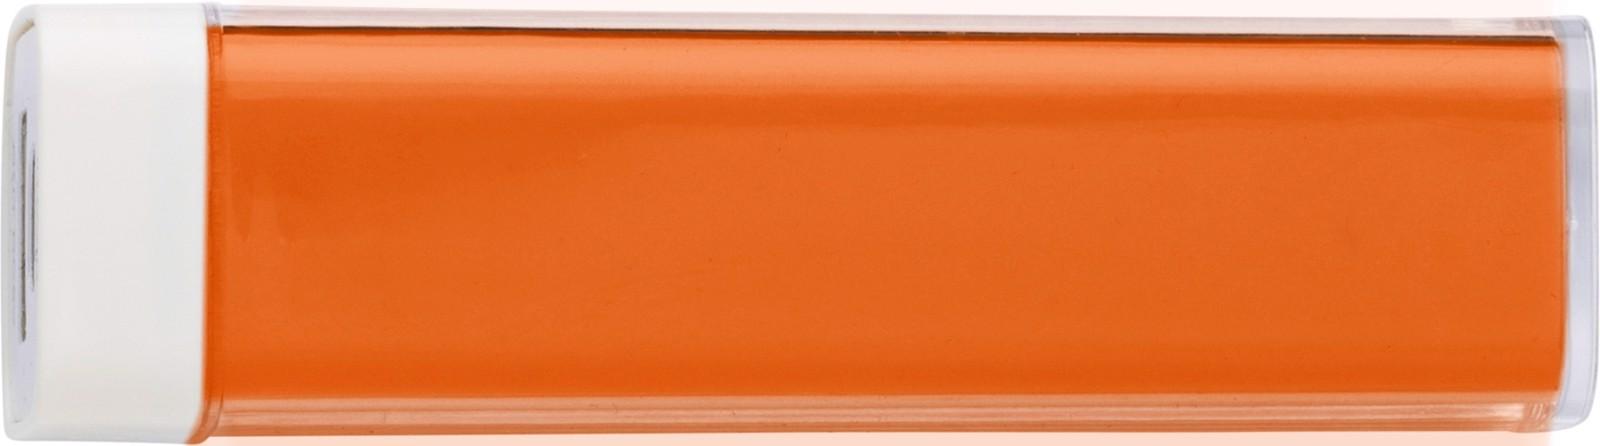 ABS power bank - Orange